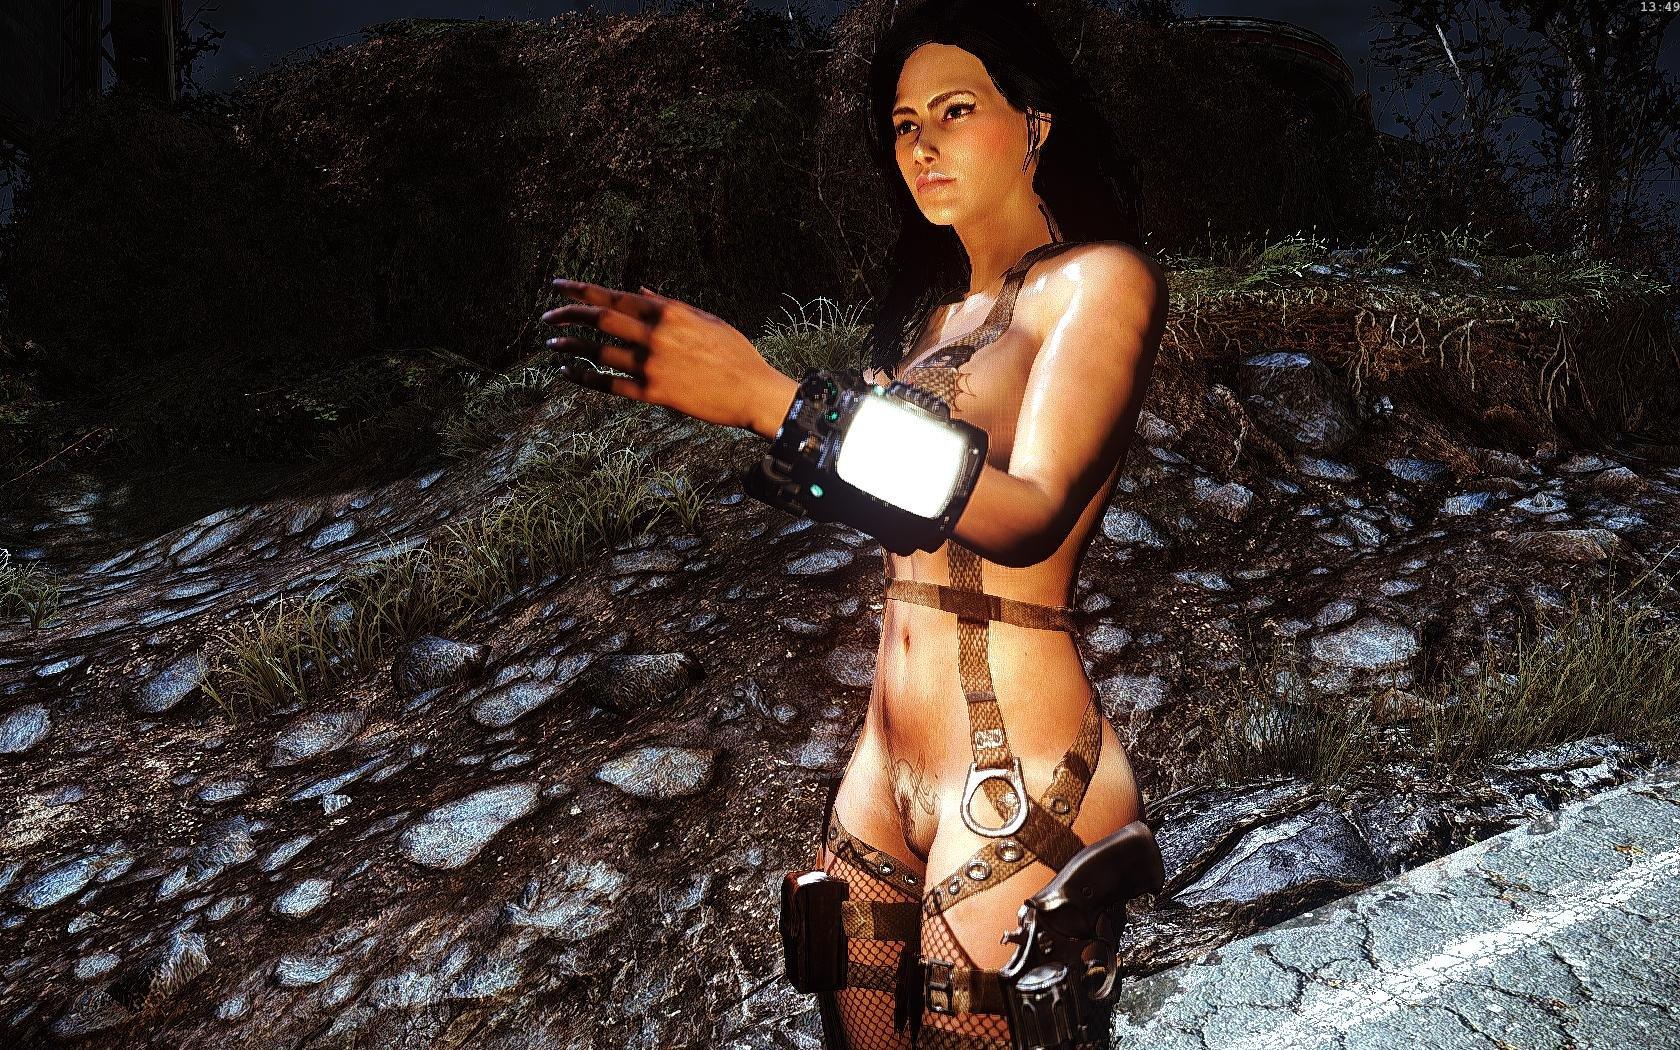 Fallout4 2019-01-09 13-49-38-62